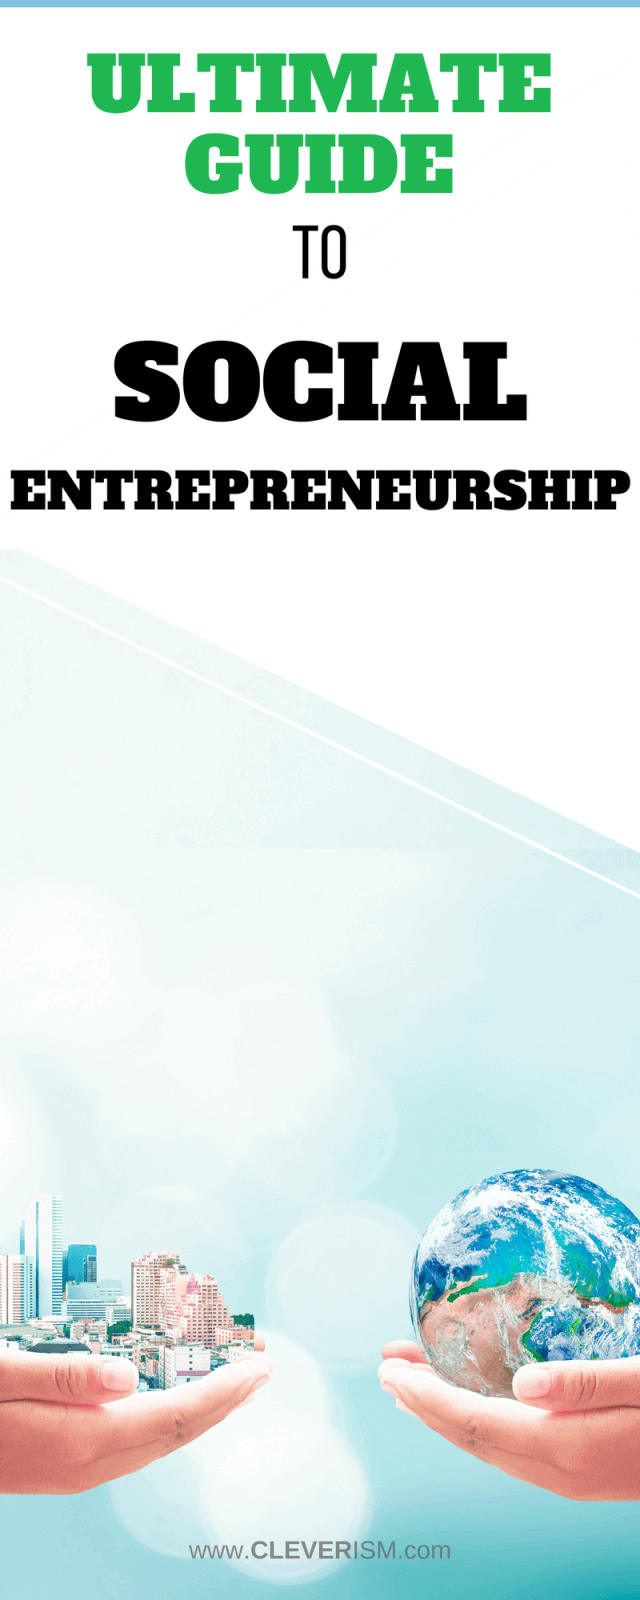 Ultimate guide to Social Entrepreneurship | Industry